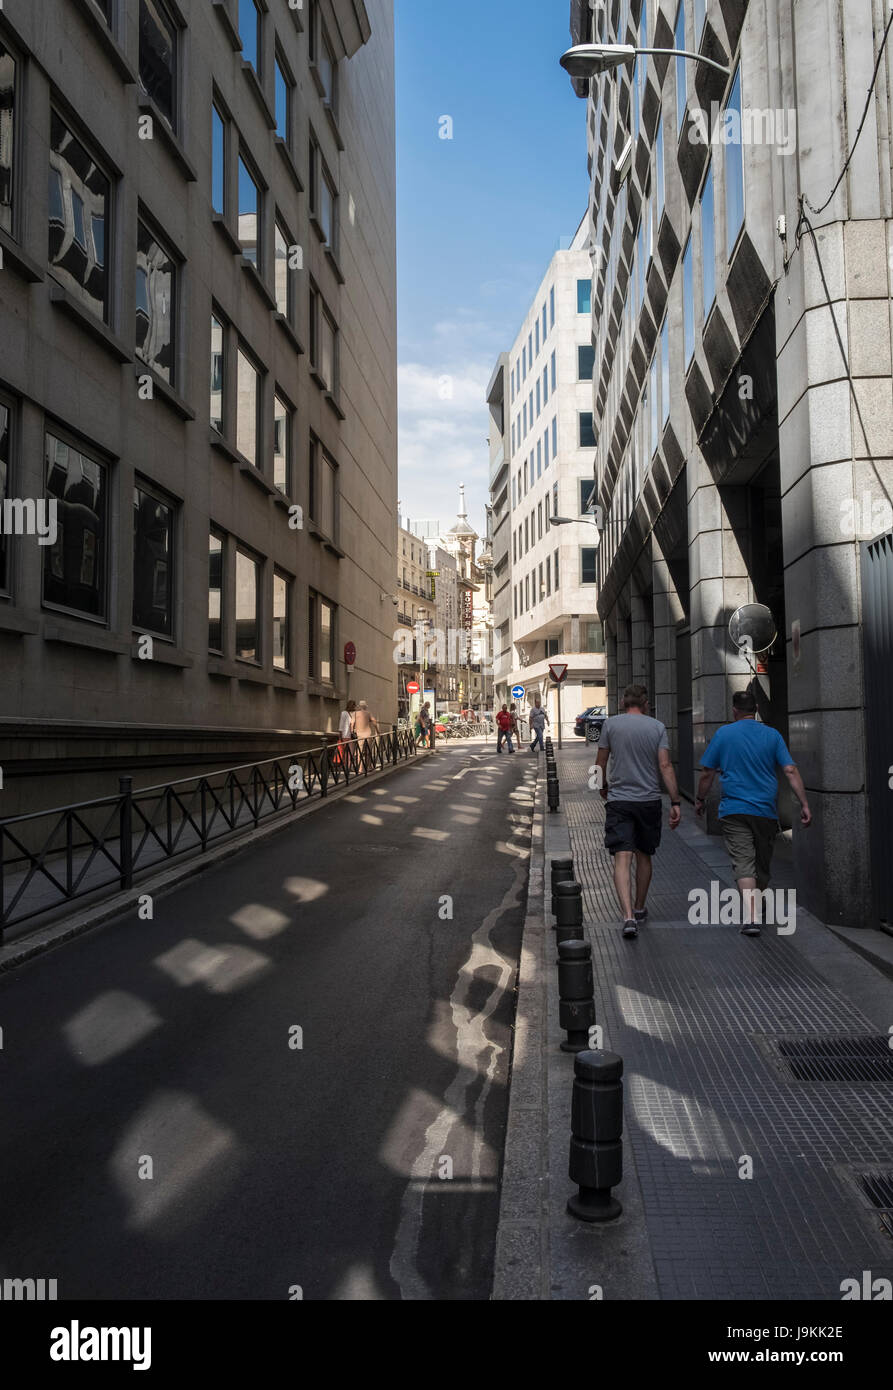 Urban street scene of modern architecture buildings, Madrid, Spain. - Stock Image